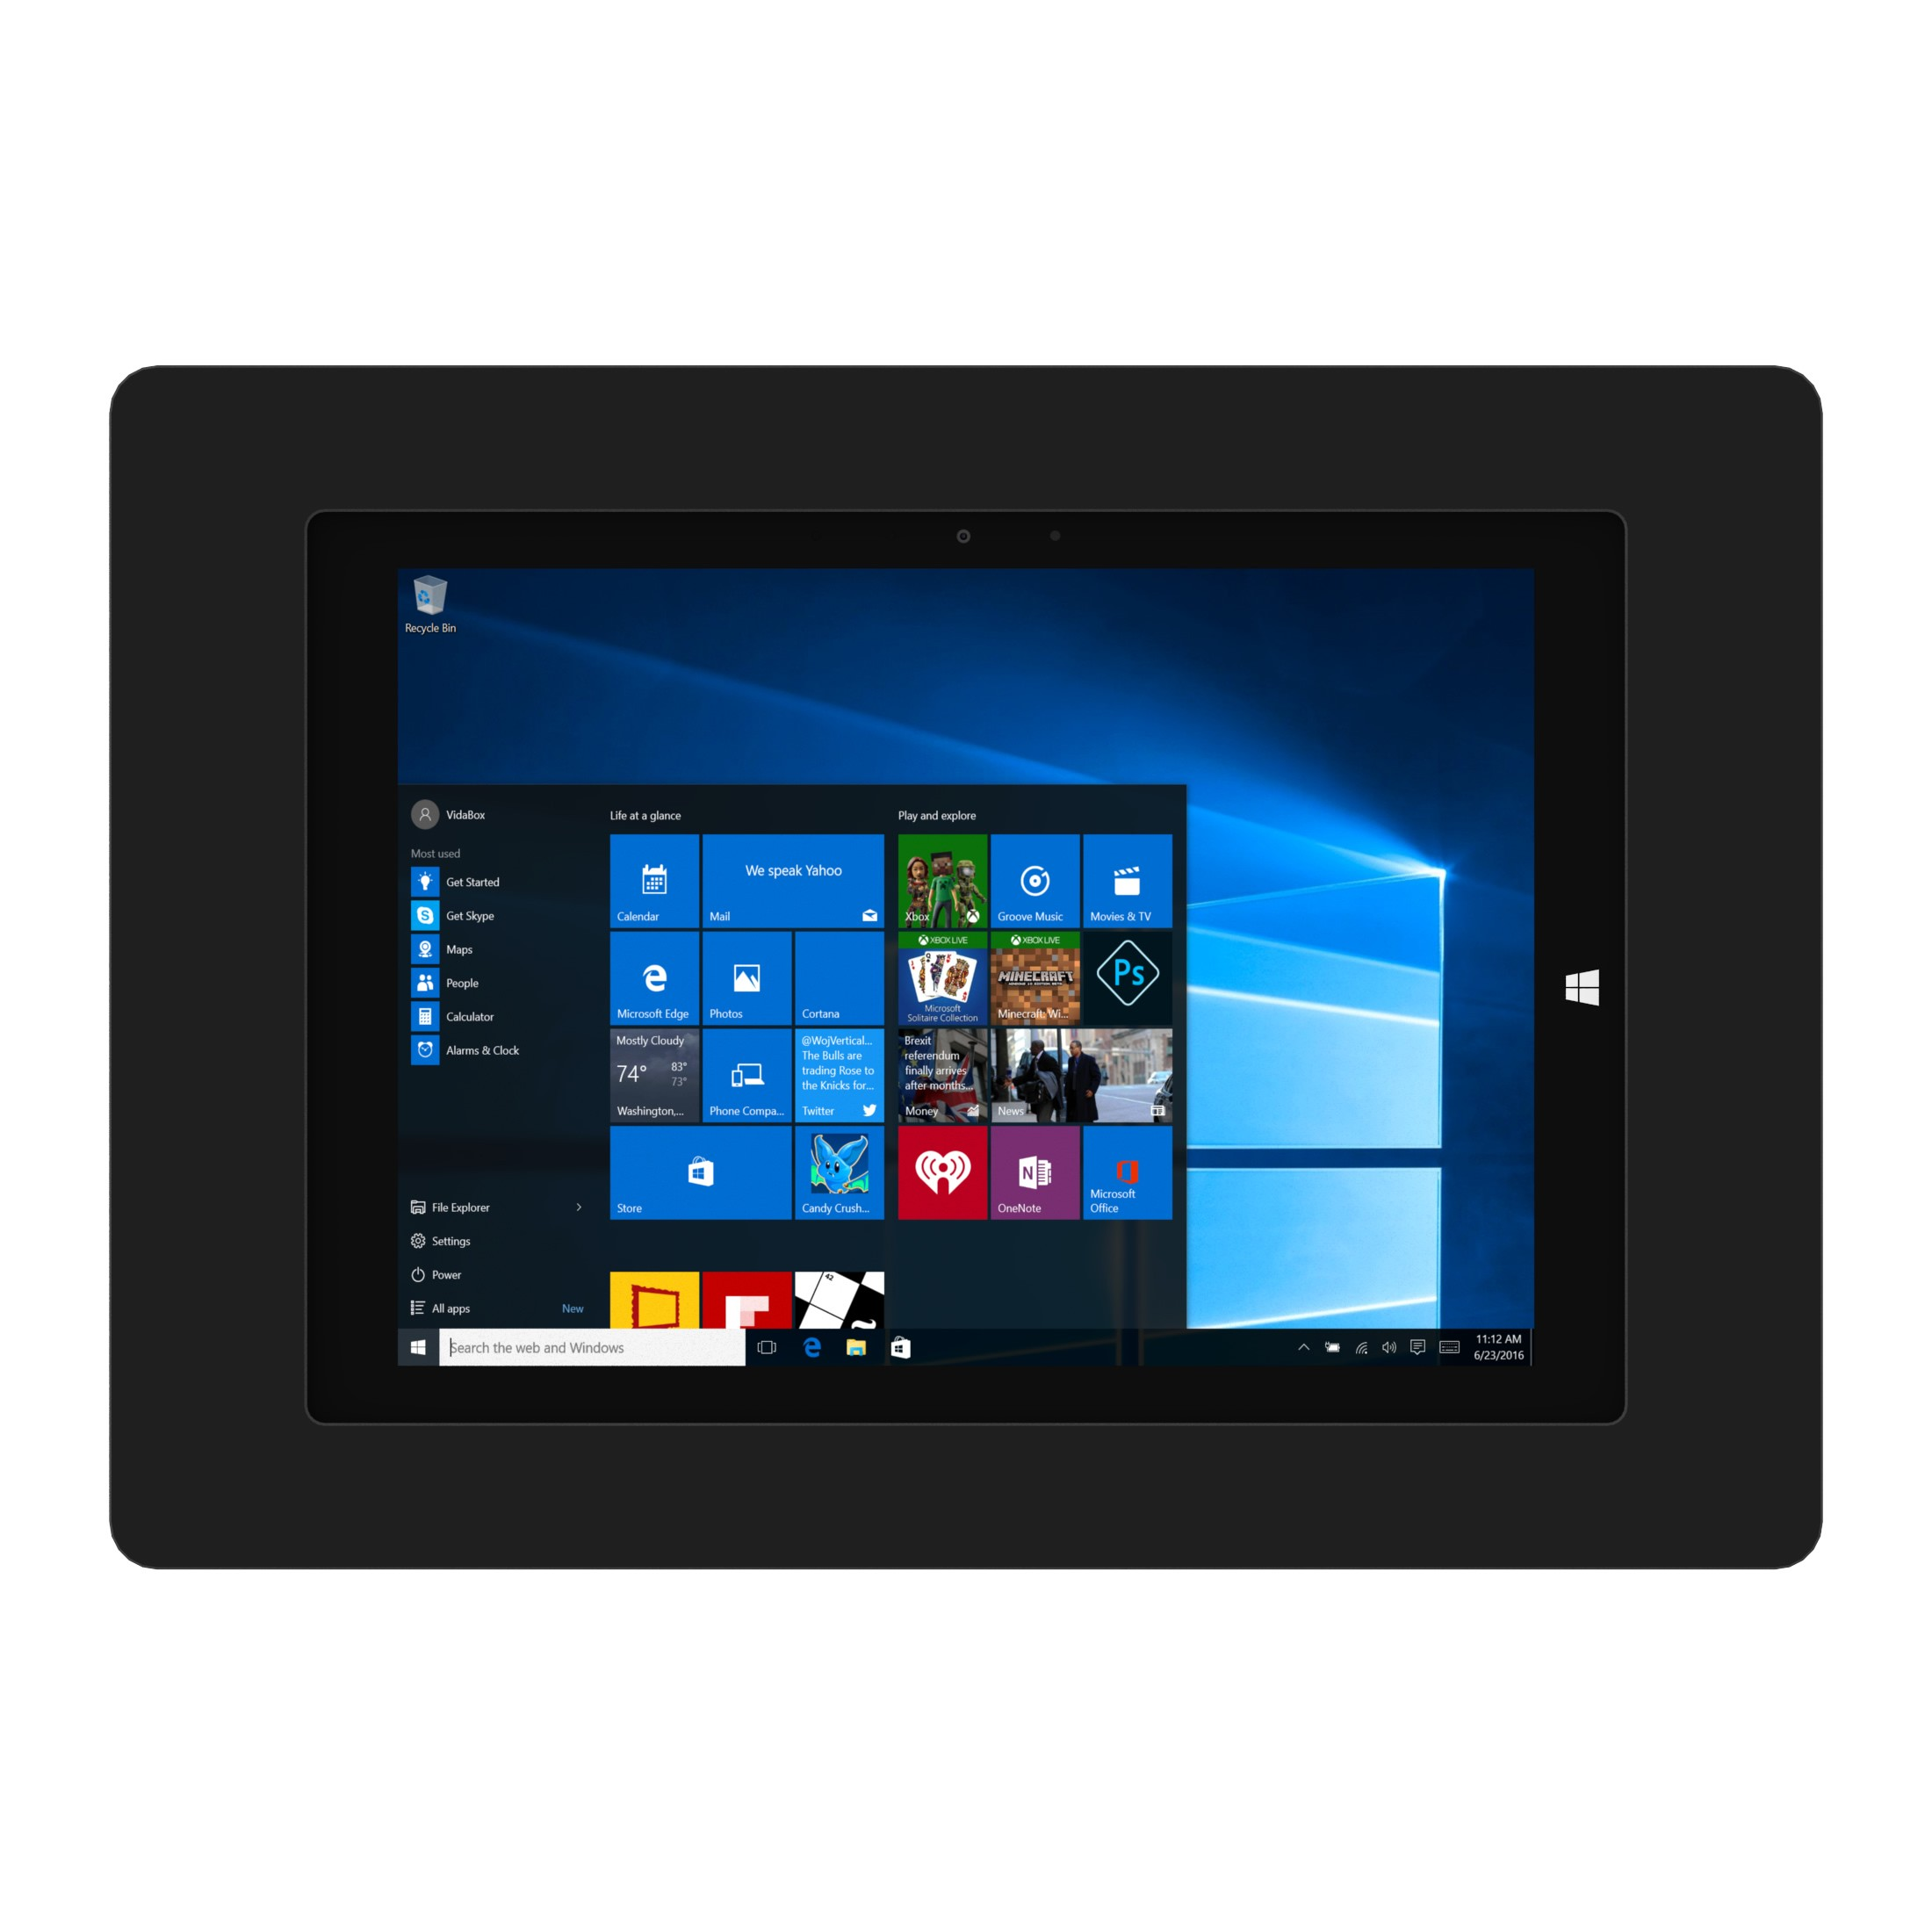 Black Microsoft Windows Surface 3 Vidamount On Wall